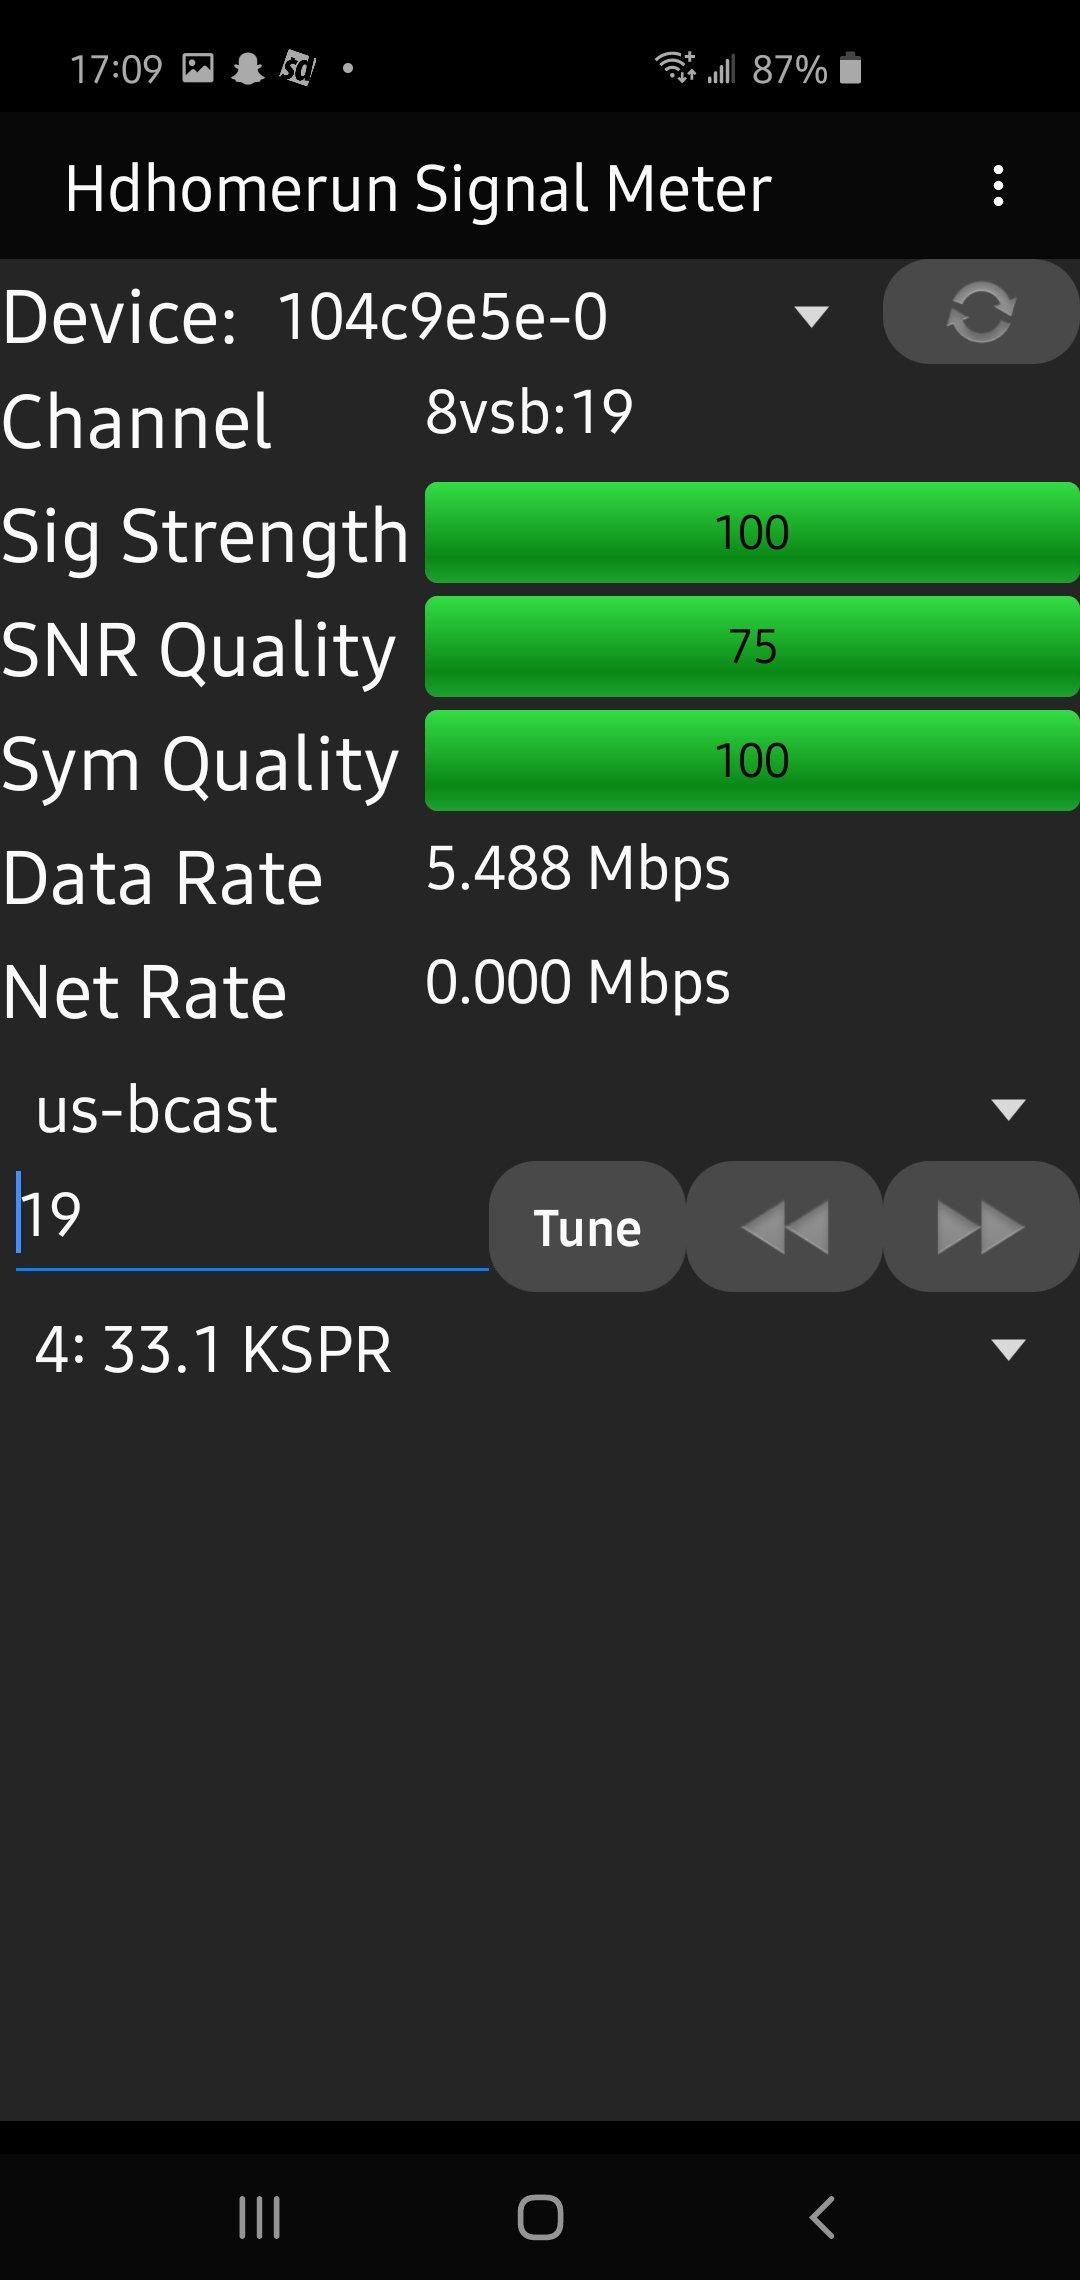 Click image for larger version  Name:Screenshot_20200218-170955_Hdhomerun Signal Meter_1582067680688.jpg Views:32 Size:262.9 KB ID:2686854